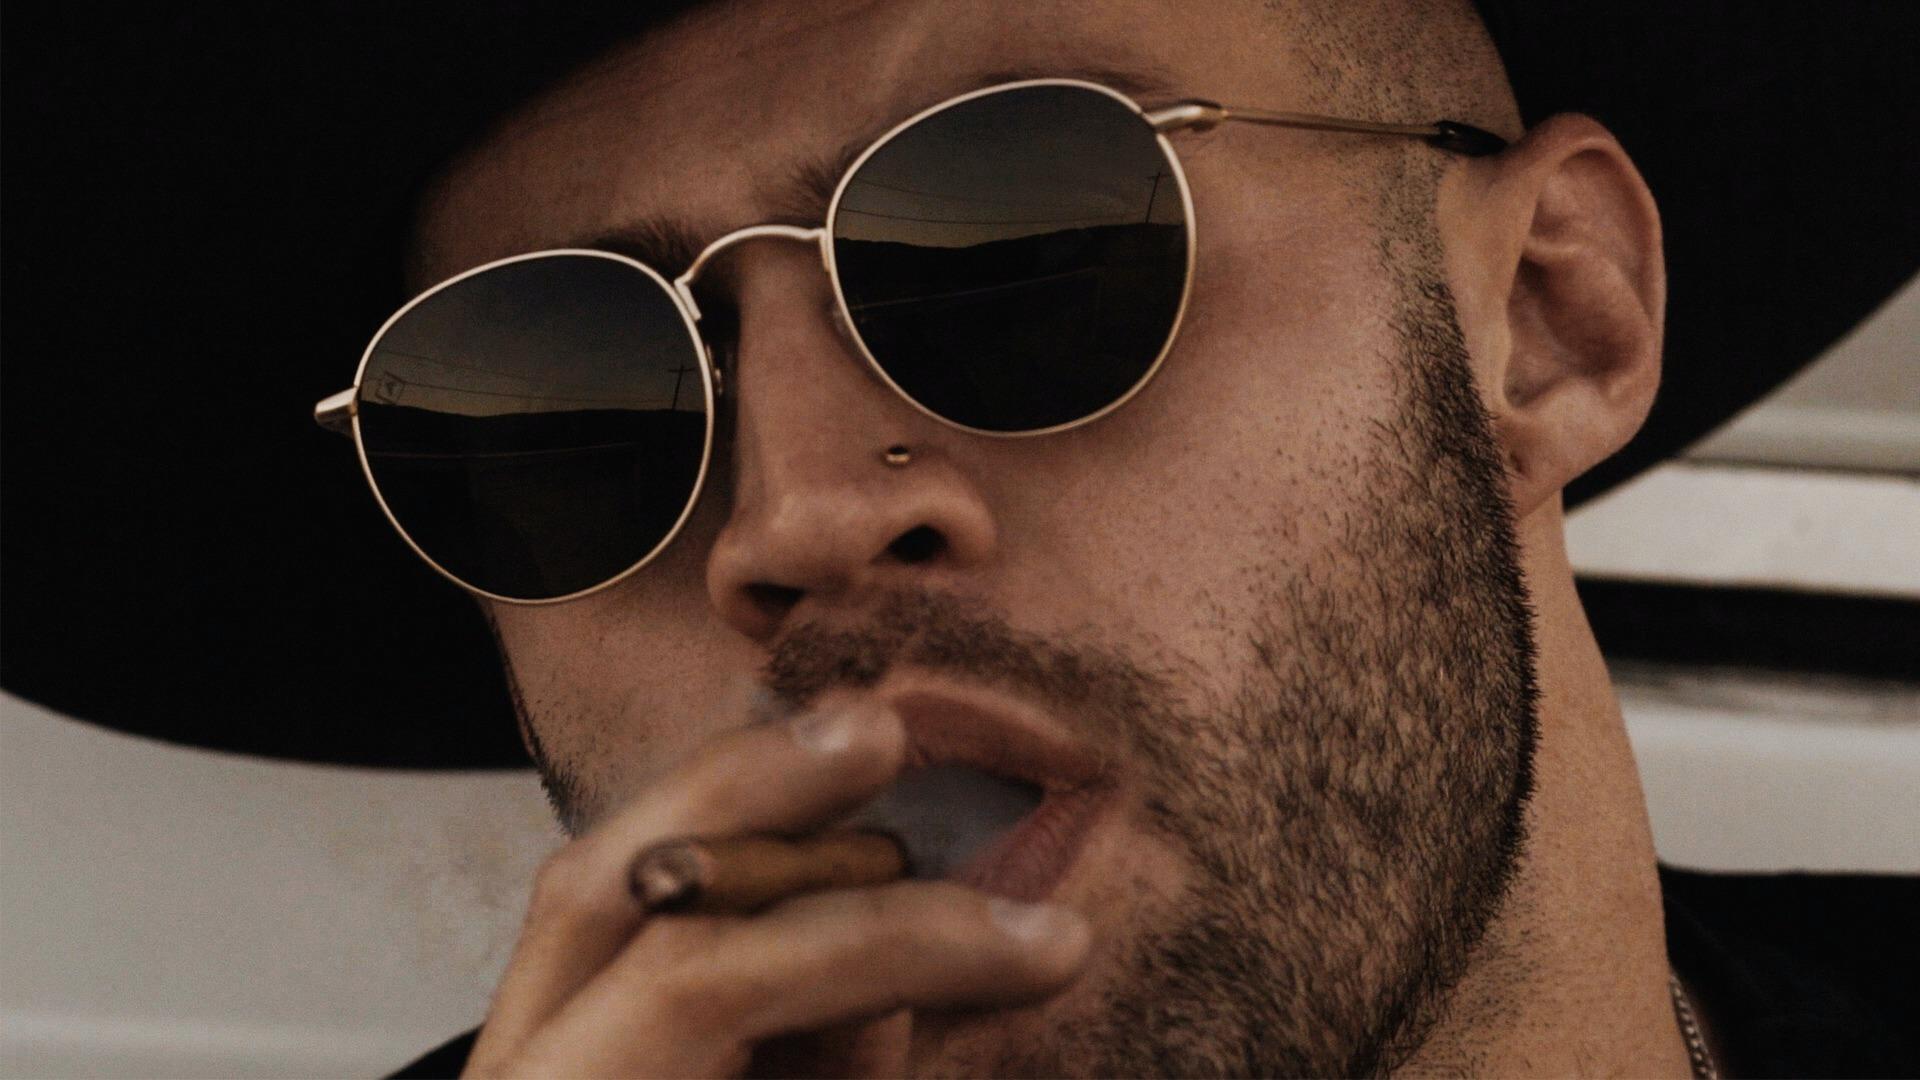 Man with sunglasses smoking a cigar